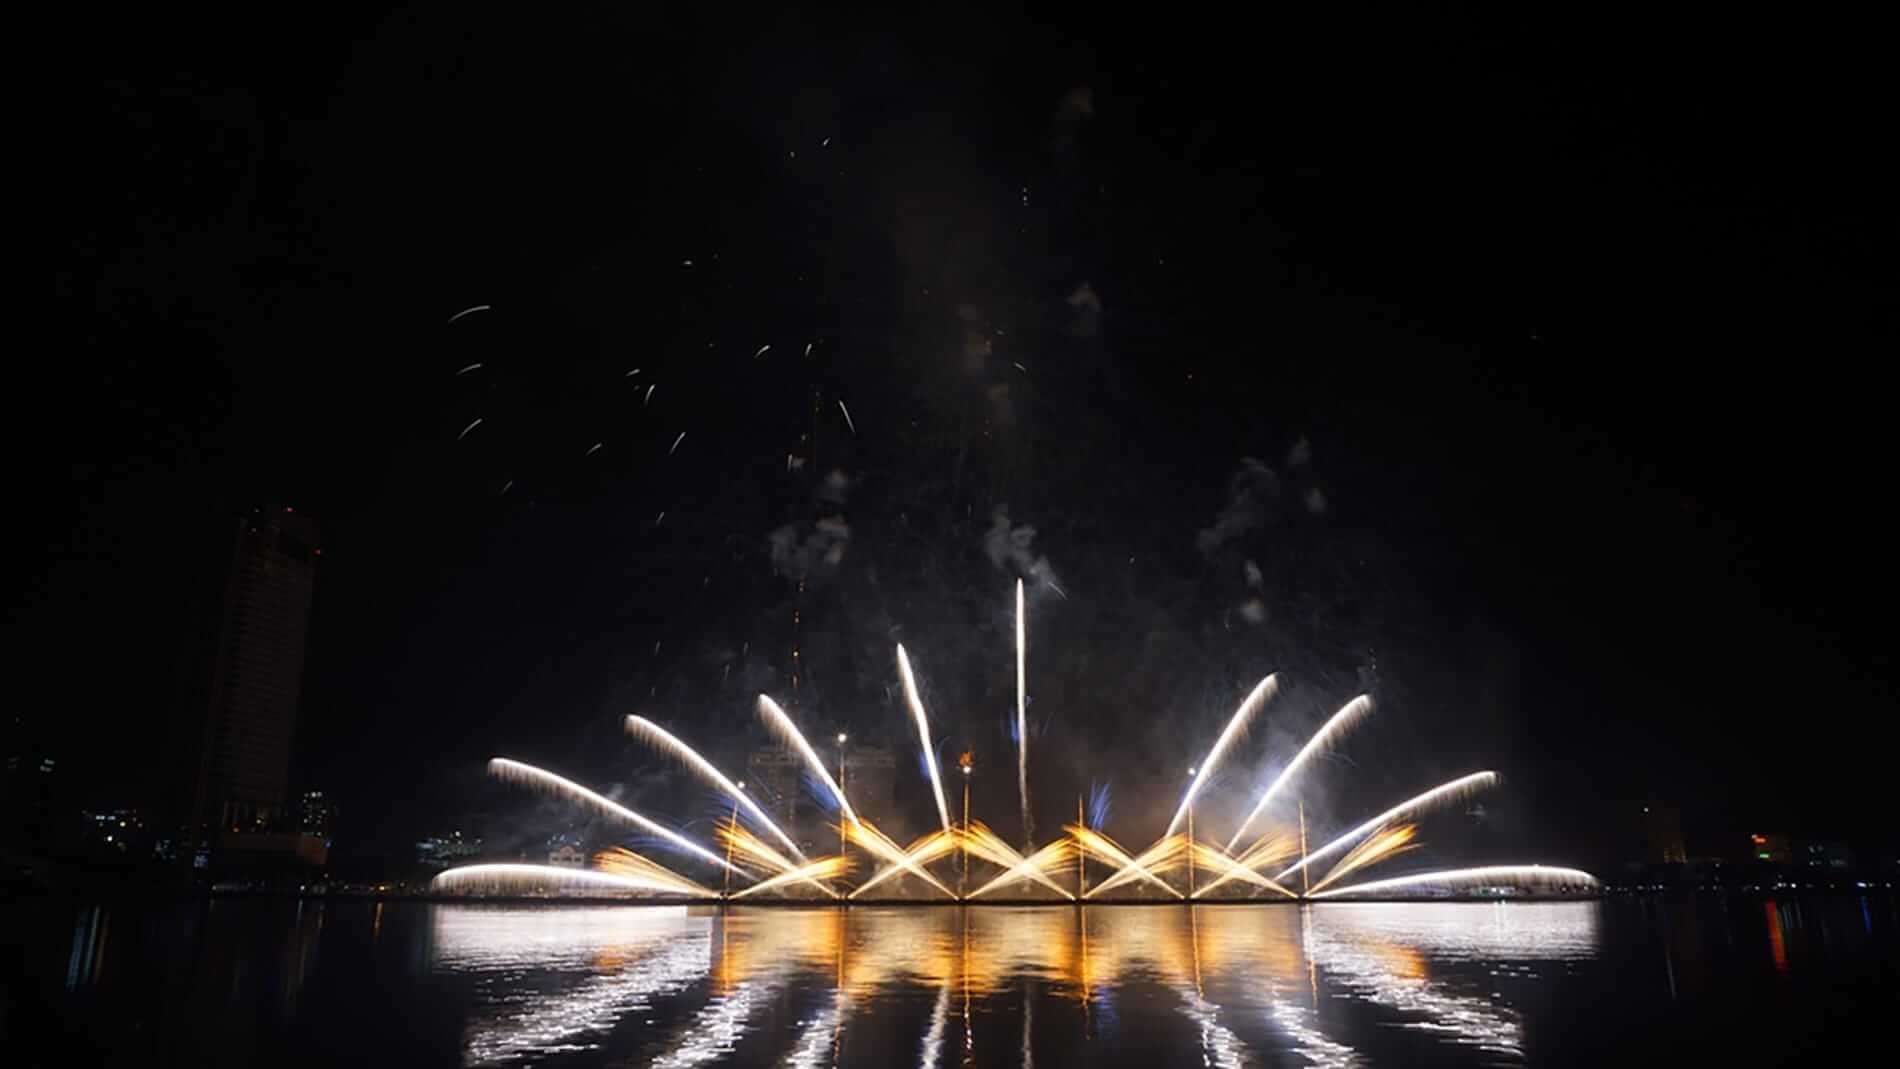 Fireworks seen from the riverbank - Da Nang Fireworks Festival